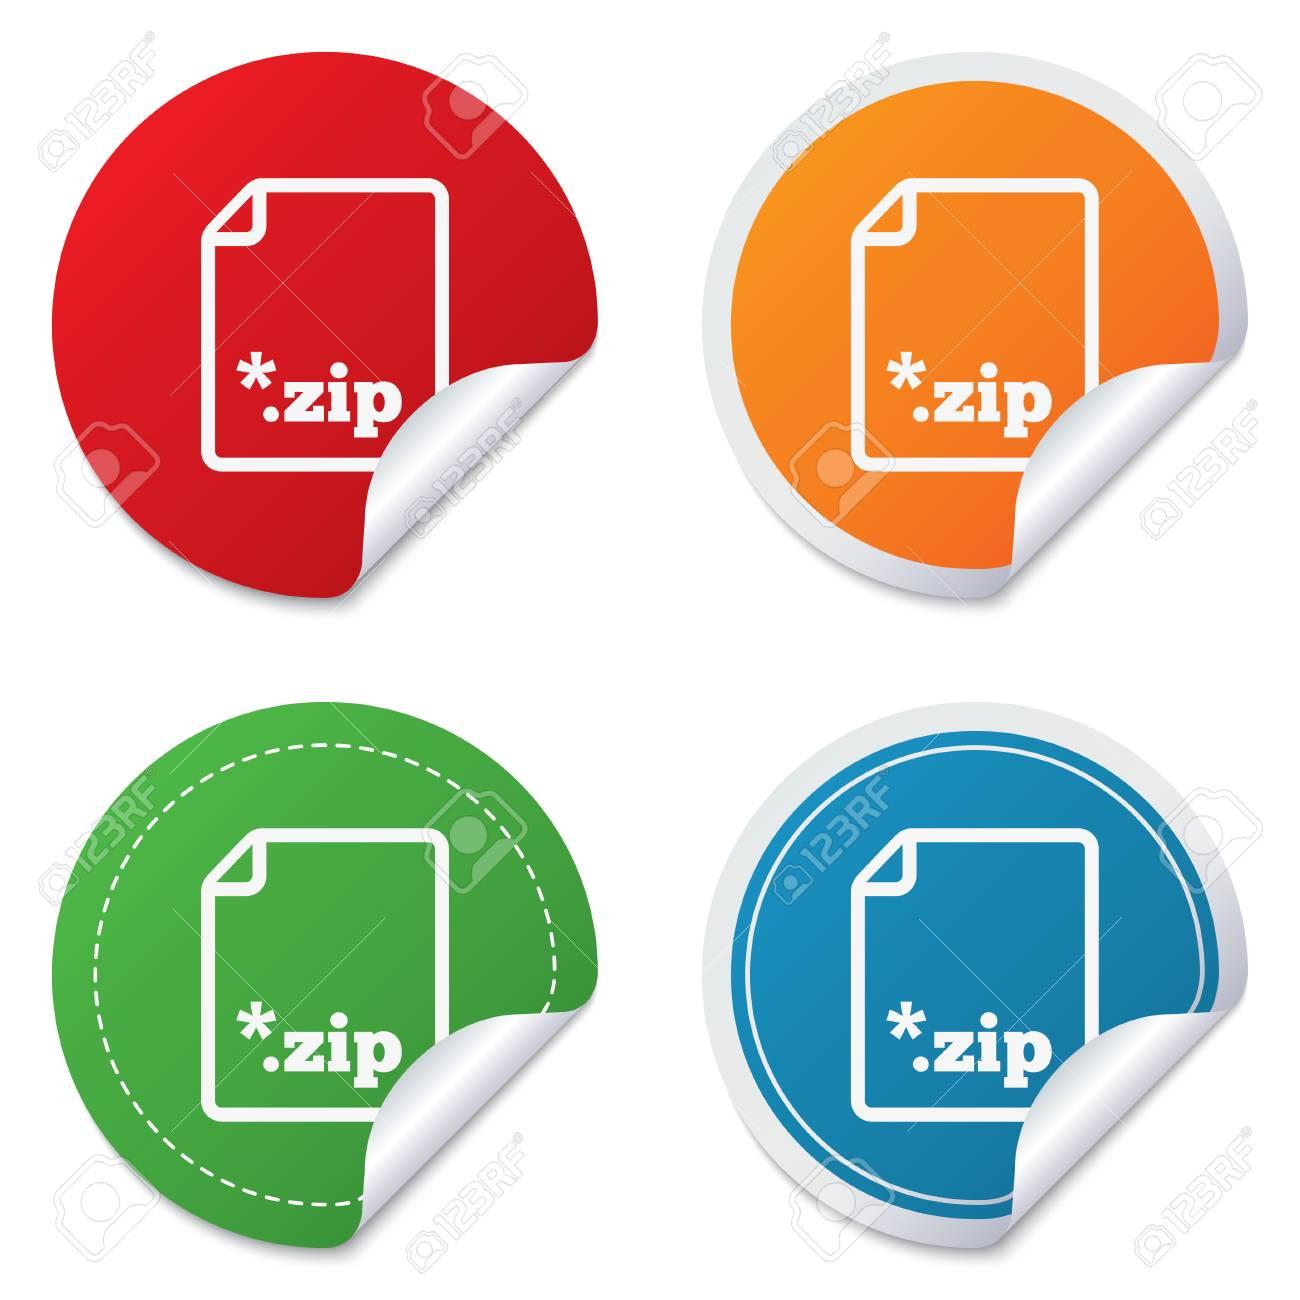 Archive File Icon  Download Compressed File Button  ZIP